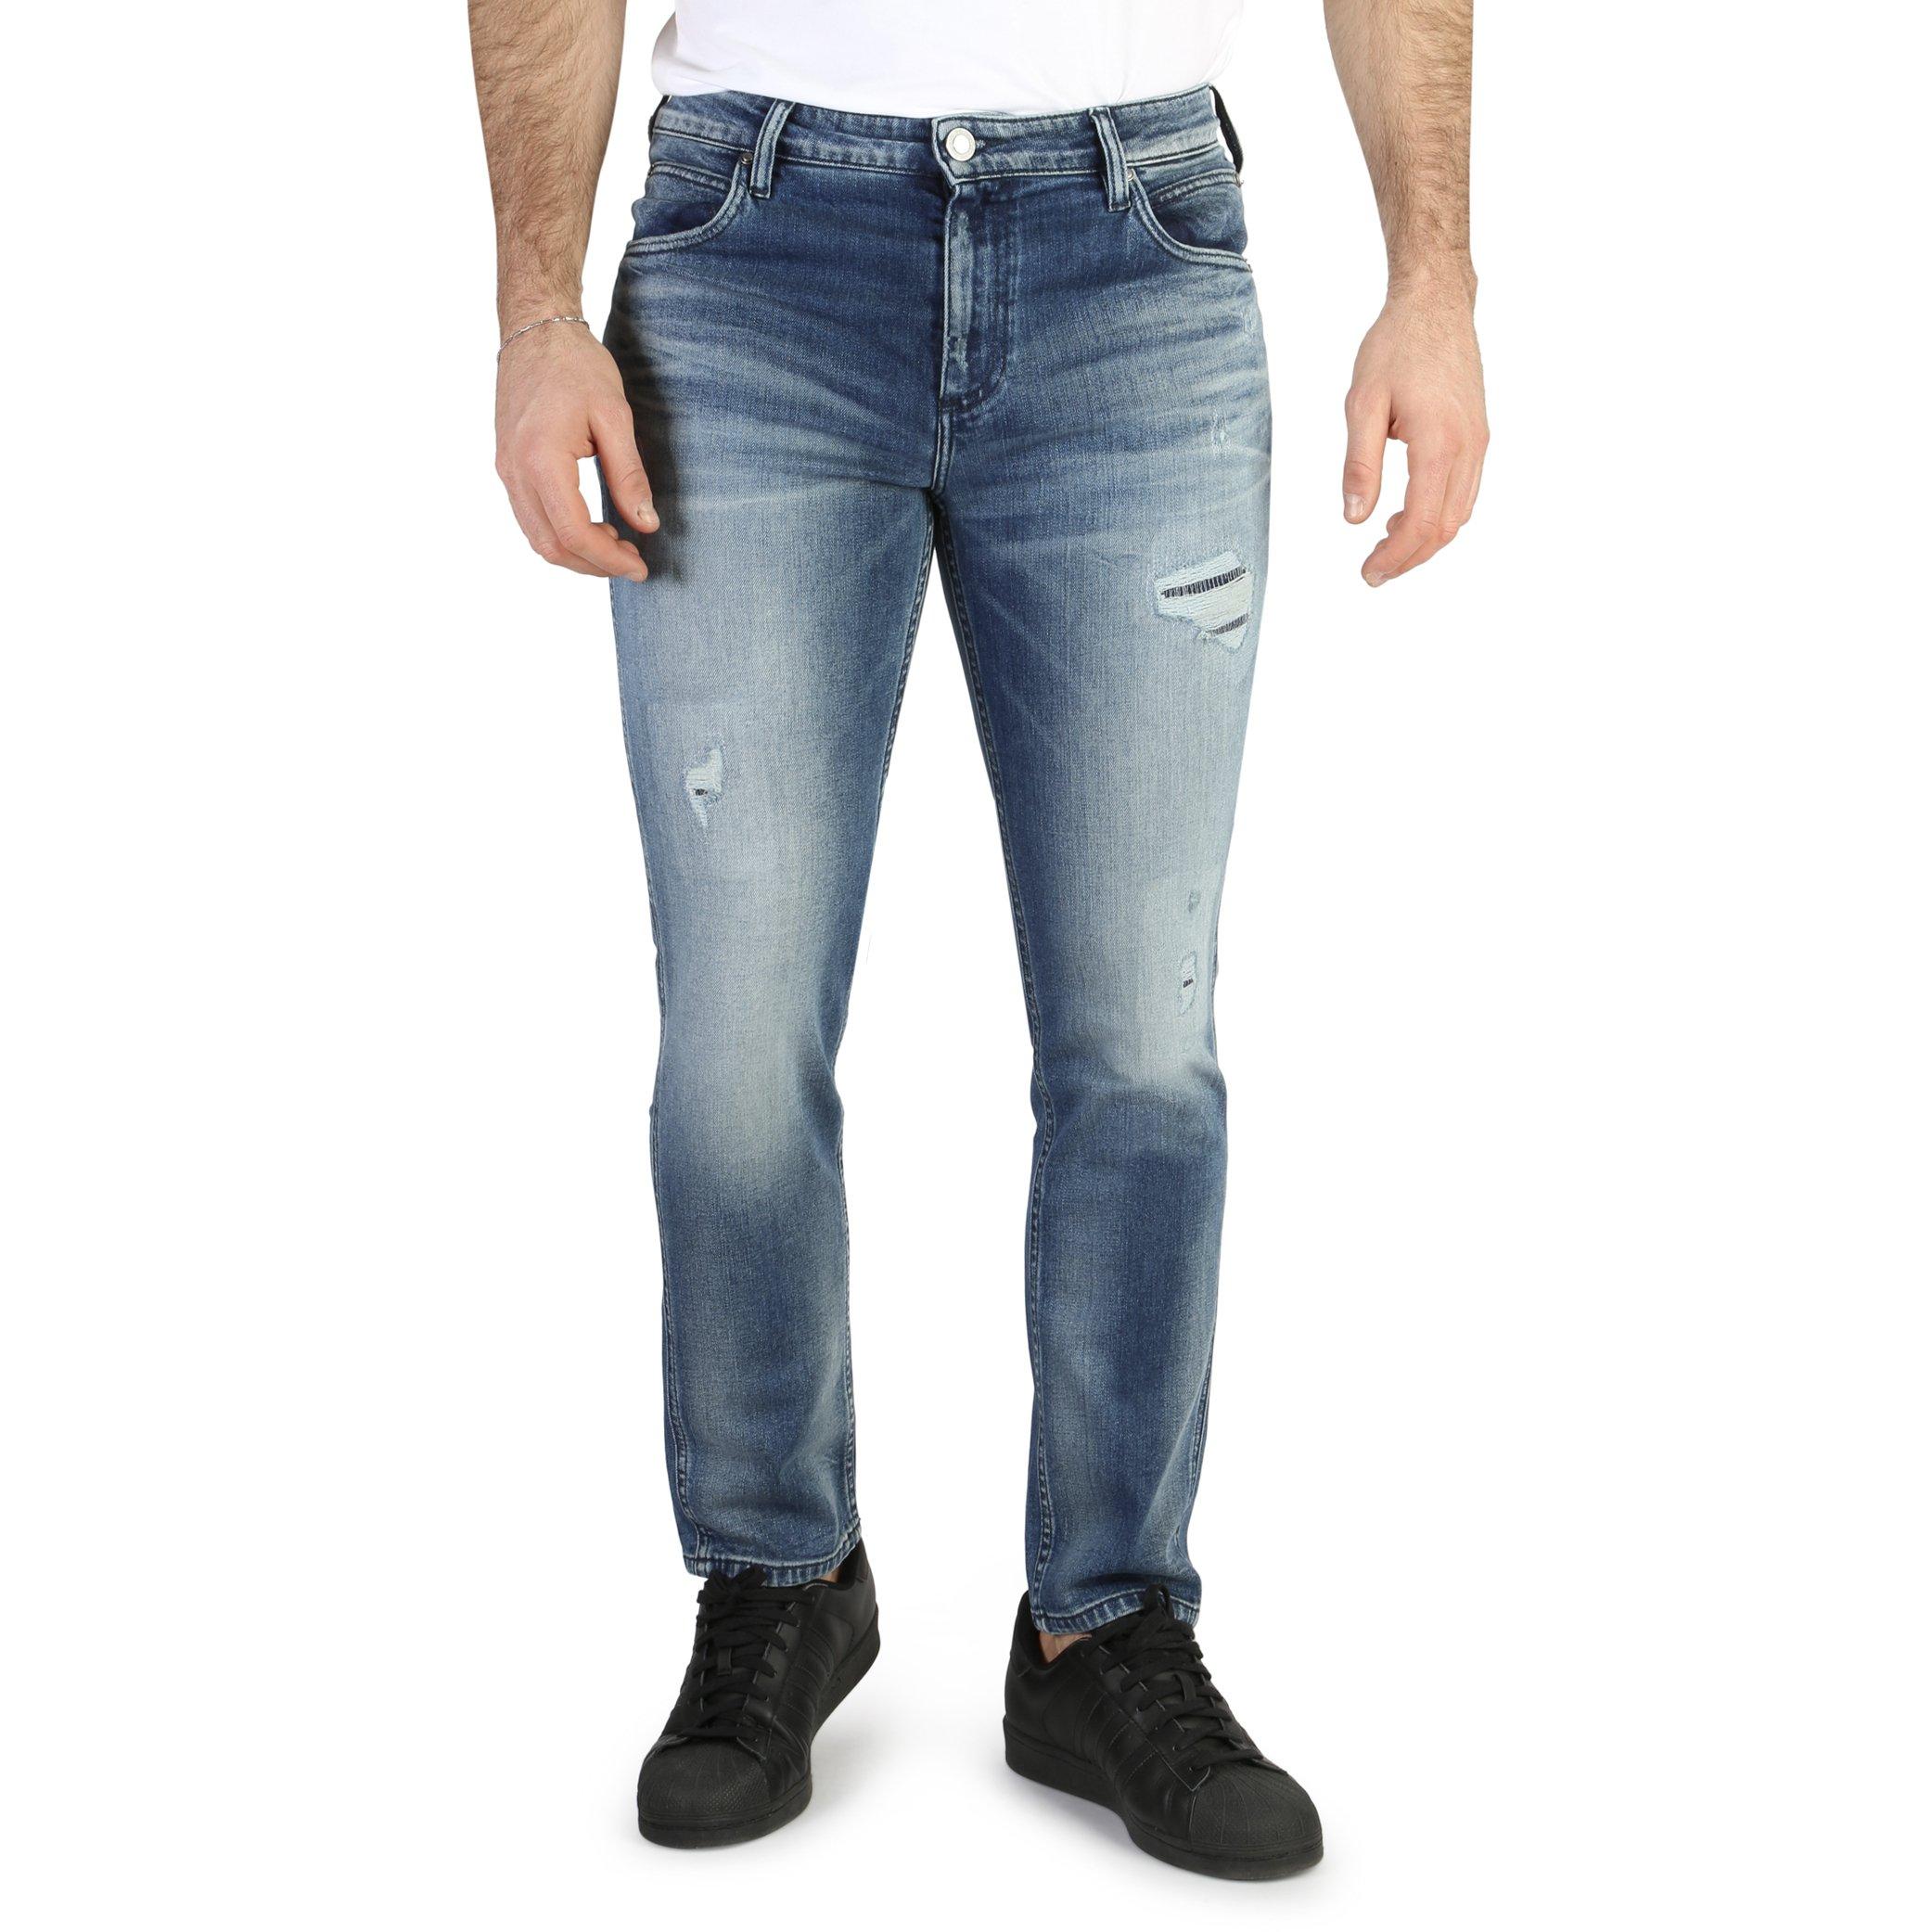 Calvin Klein Men's Jeans Blue J30J304914 - blue-1 30